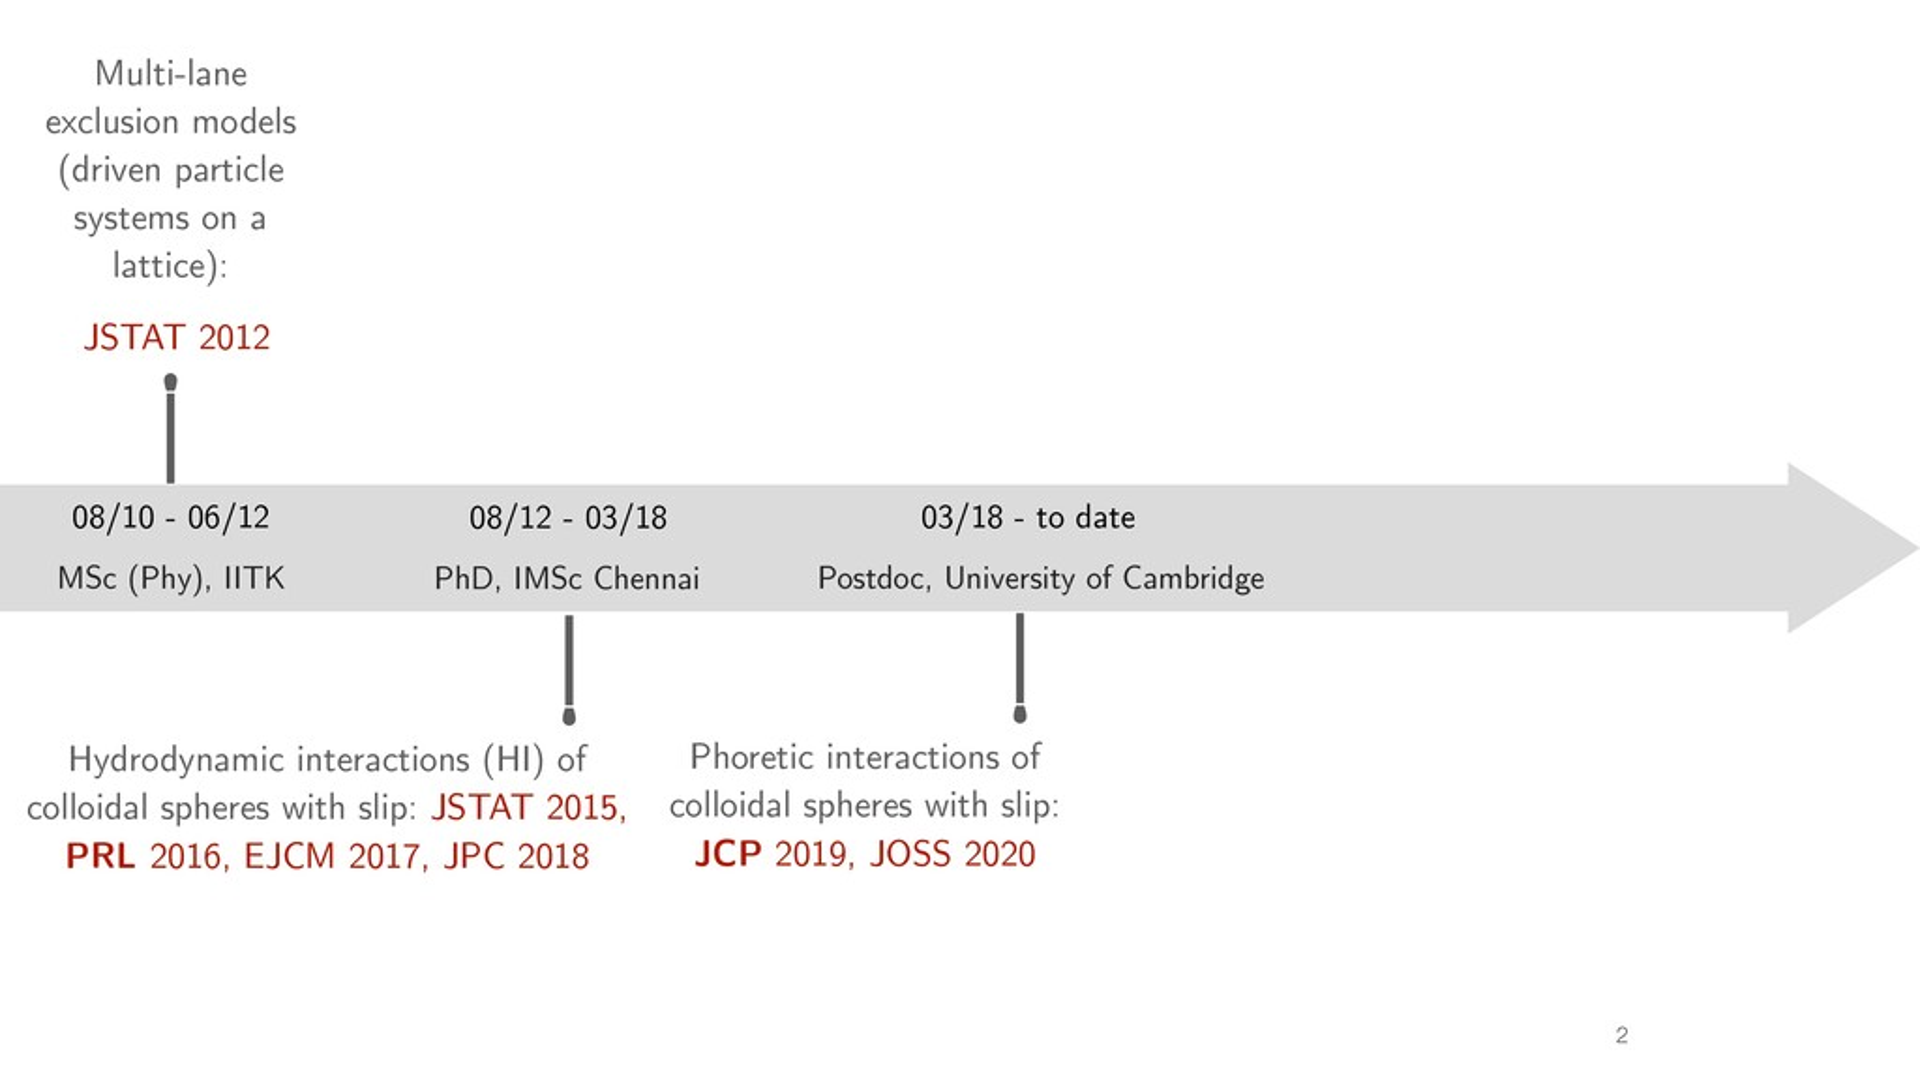 MSc (Phy), IITK 08/10 - 06/12 PhD, IMSc Chennai...